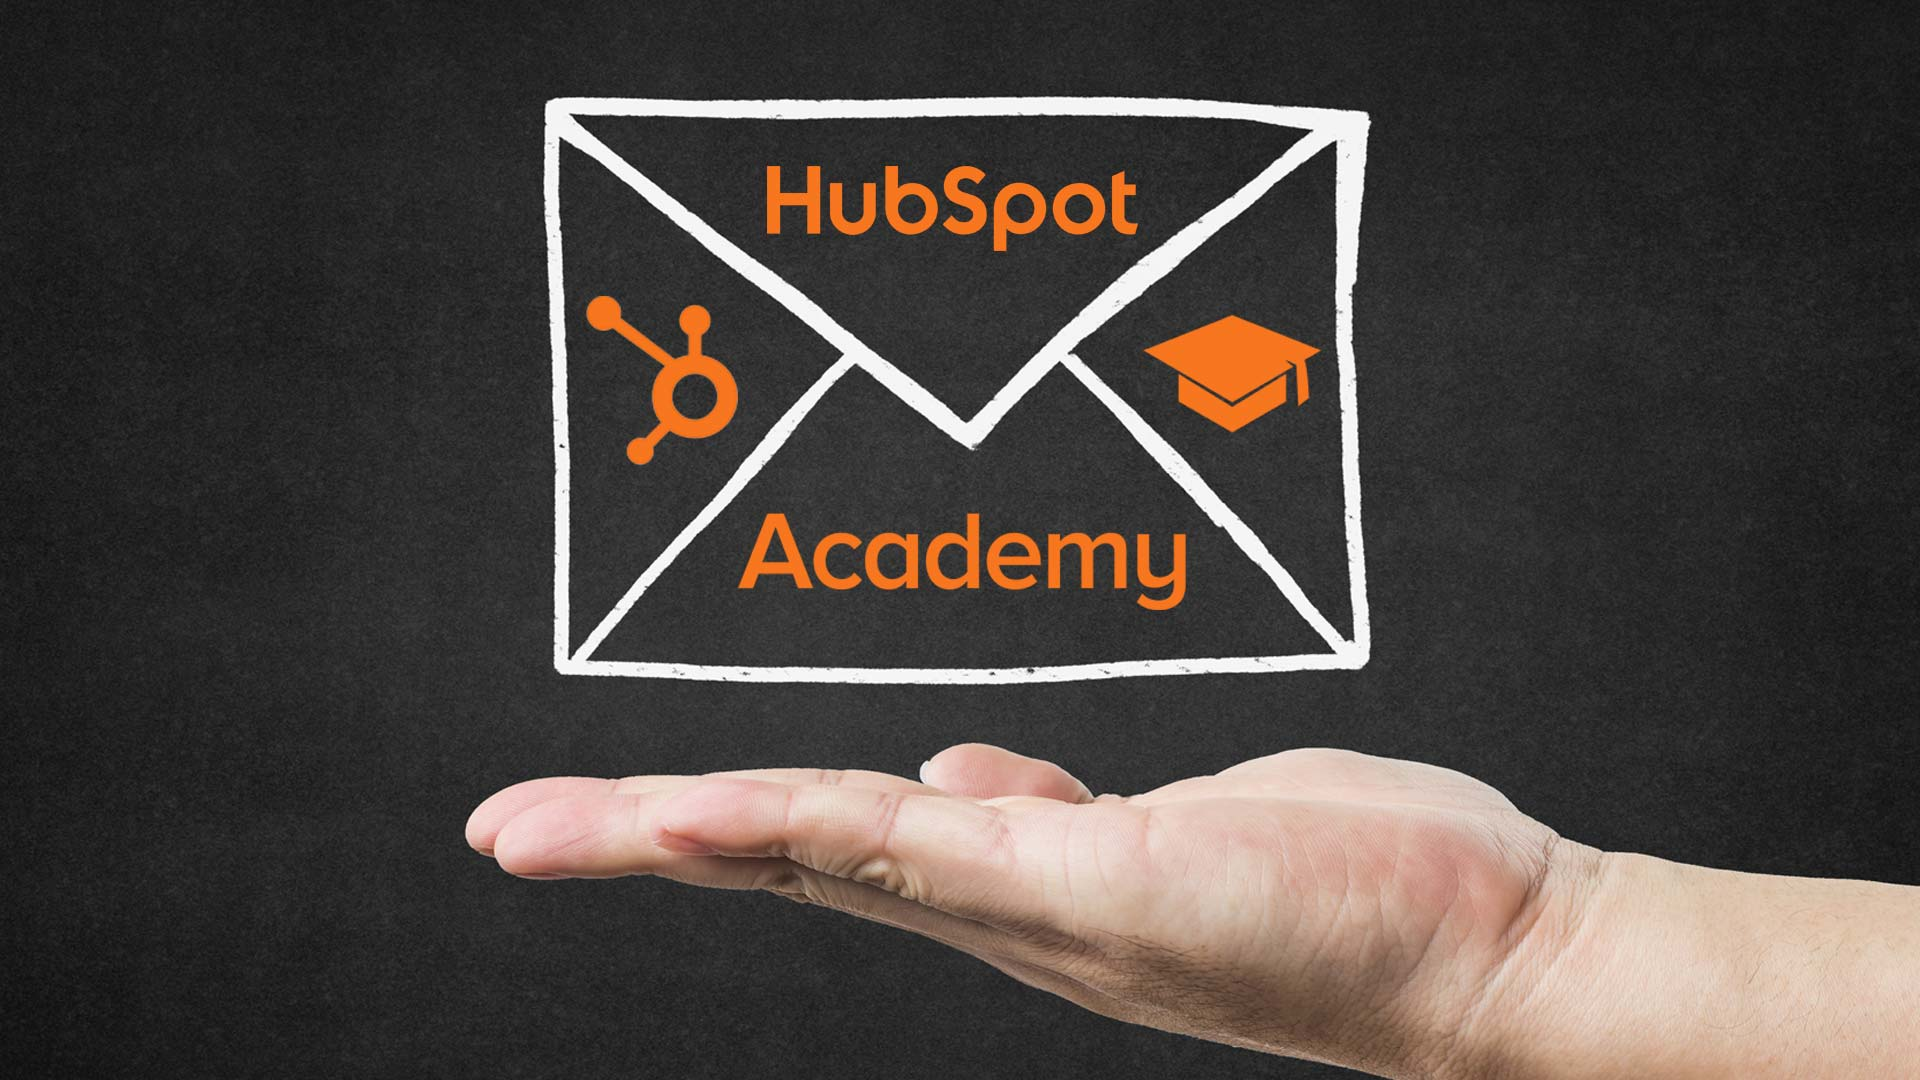 Consigli email marketing | Approfondisci con la HubSpot Academy